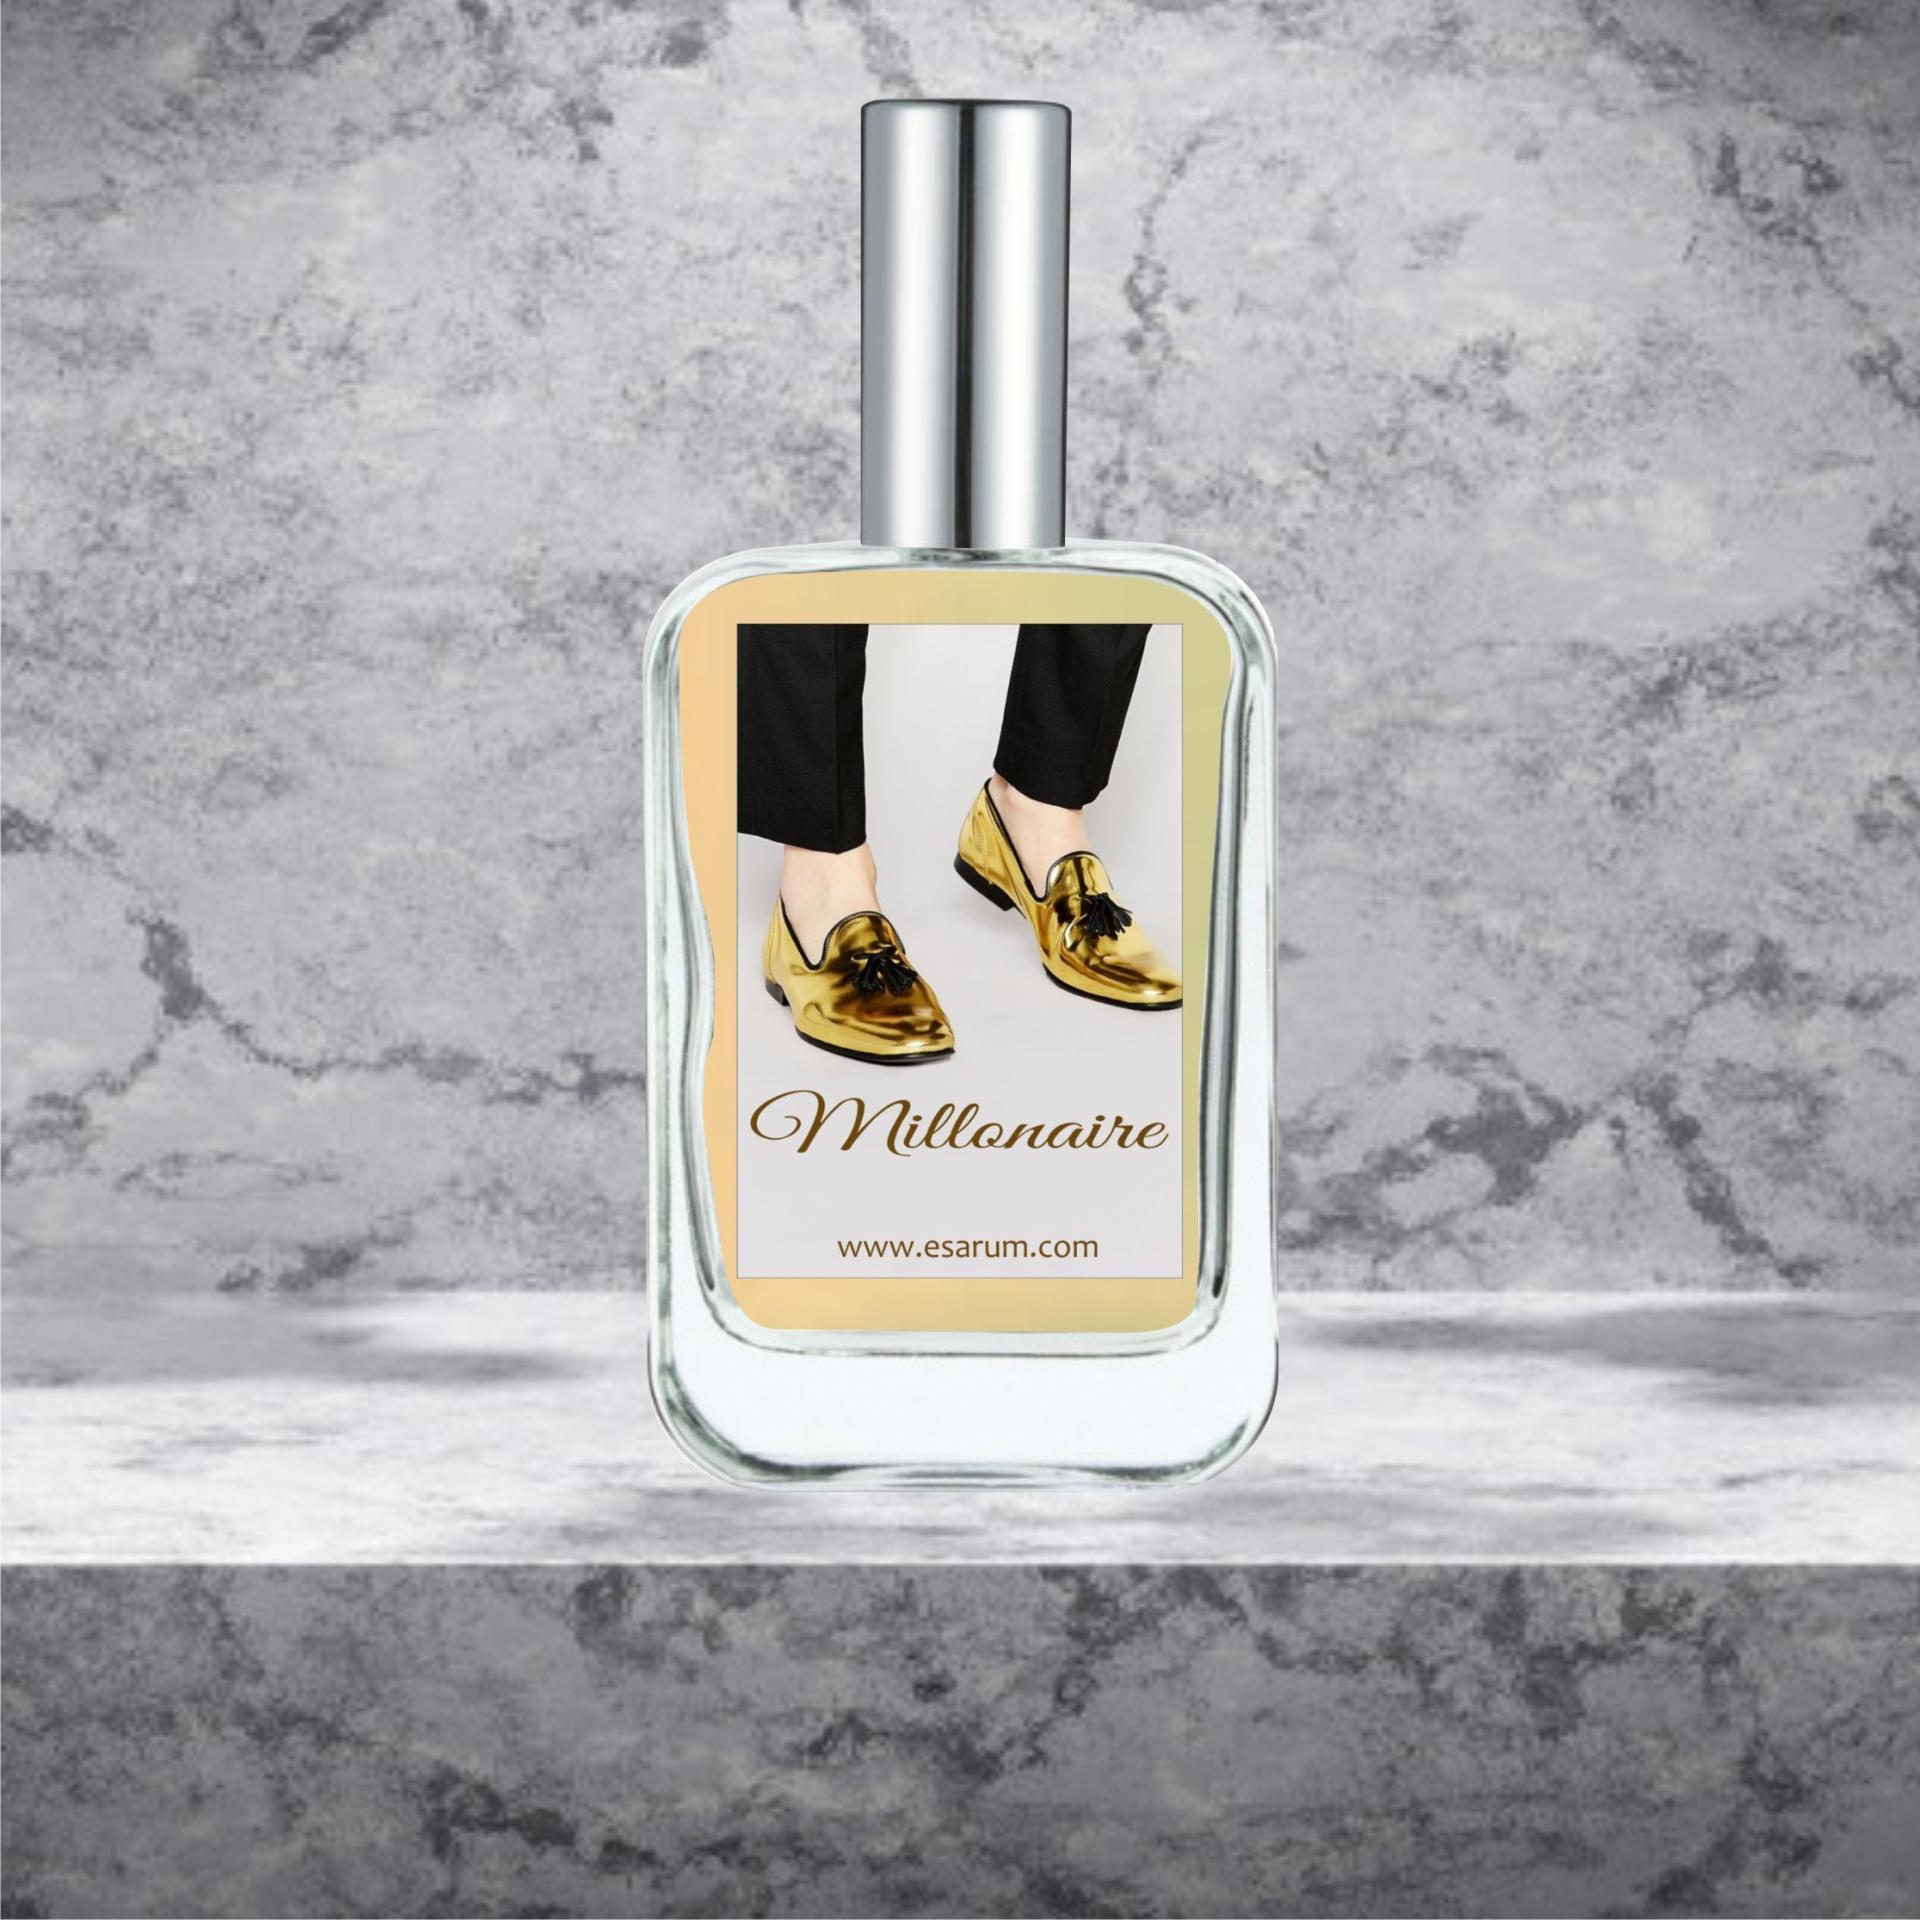 ESARUM.COM - MILLONAIRE PERFUME PERMANENTE, 50 ML. Si te gusta ONE MILLION de PACO RABANNE !